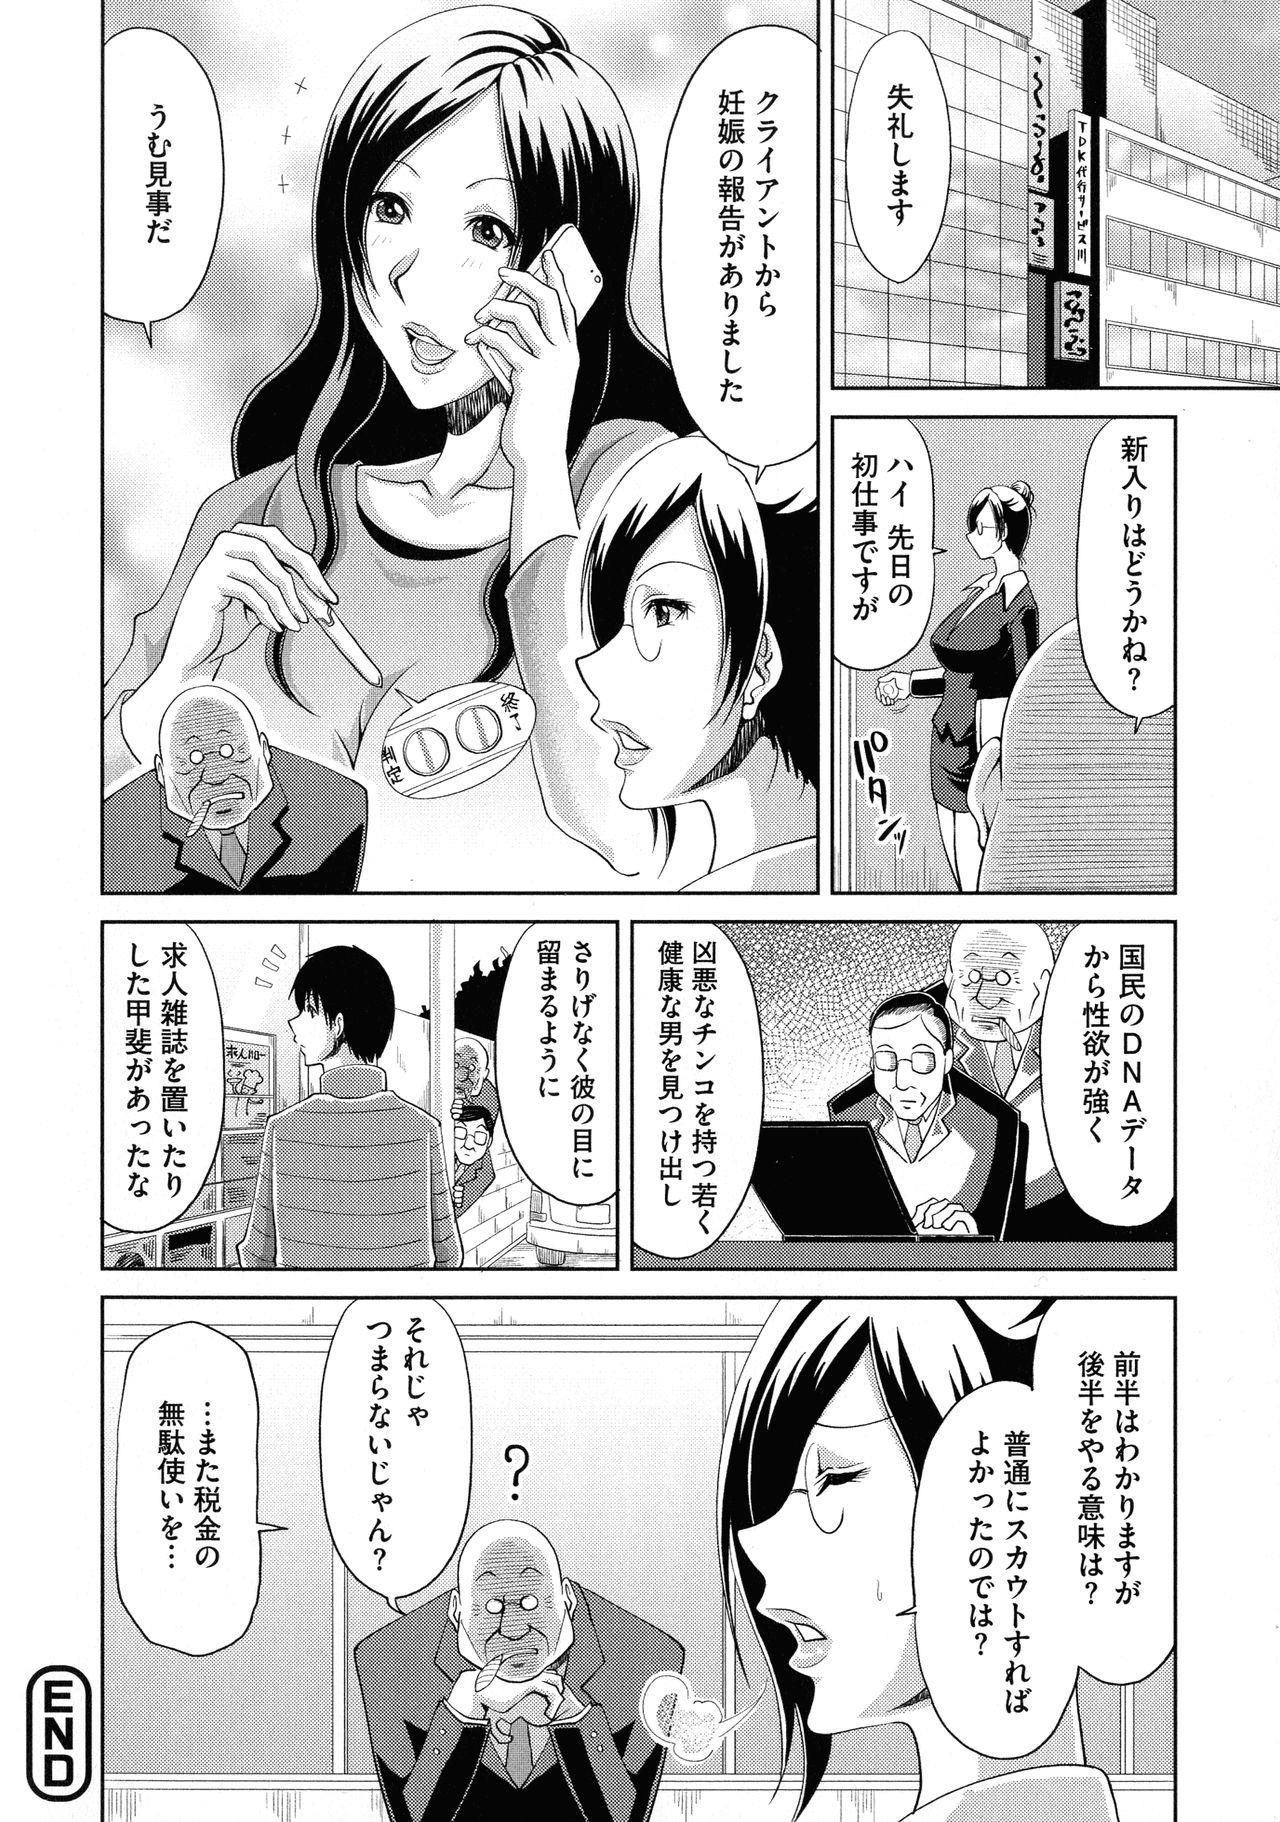 Haramase! 192